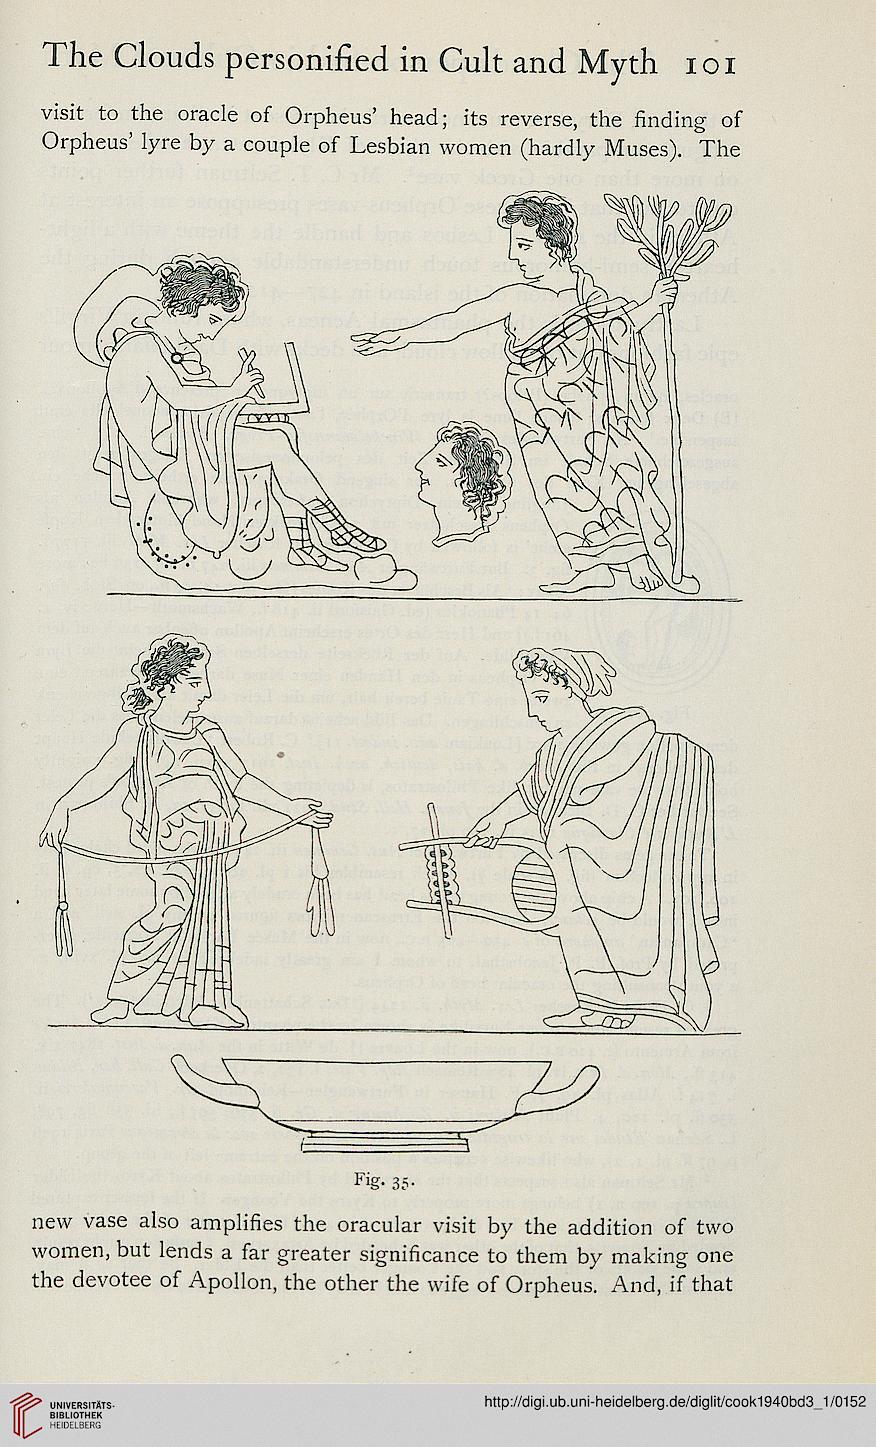 cook, arthur b zeus a study in ancient religion (band 3,1) zeus